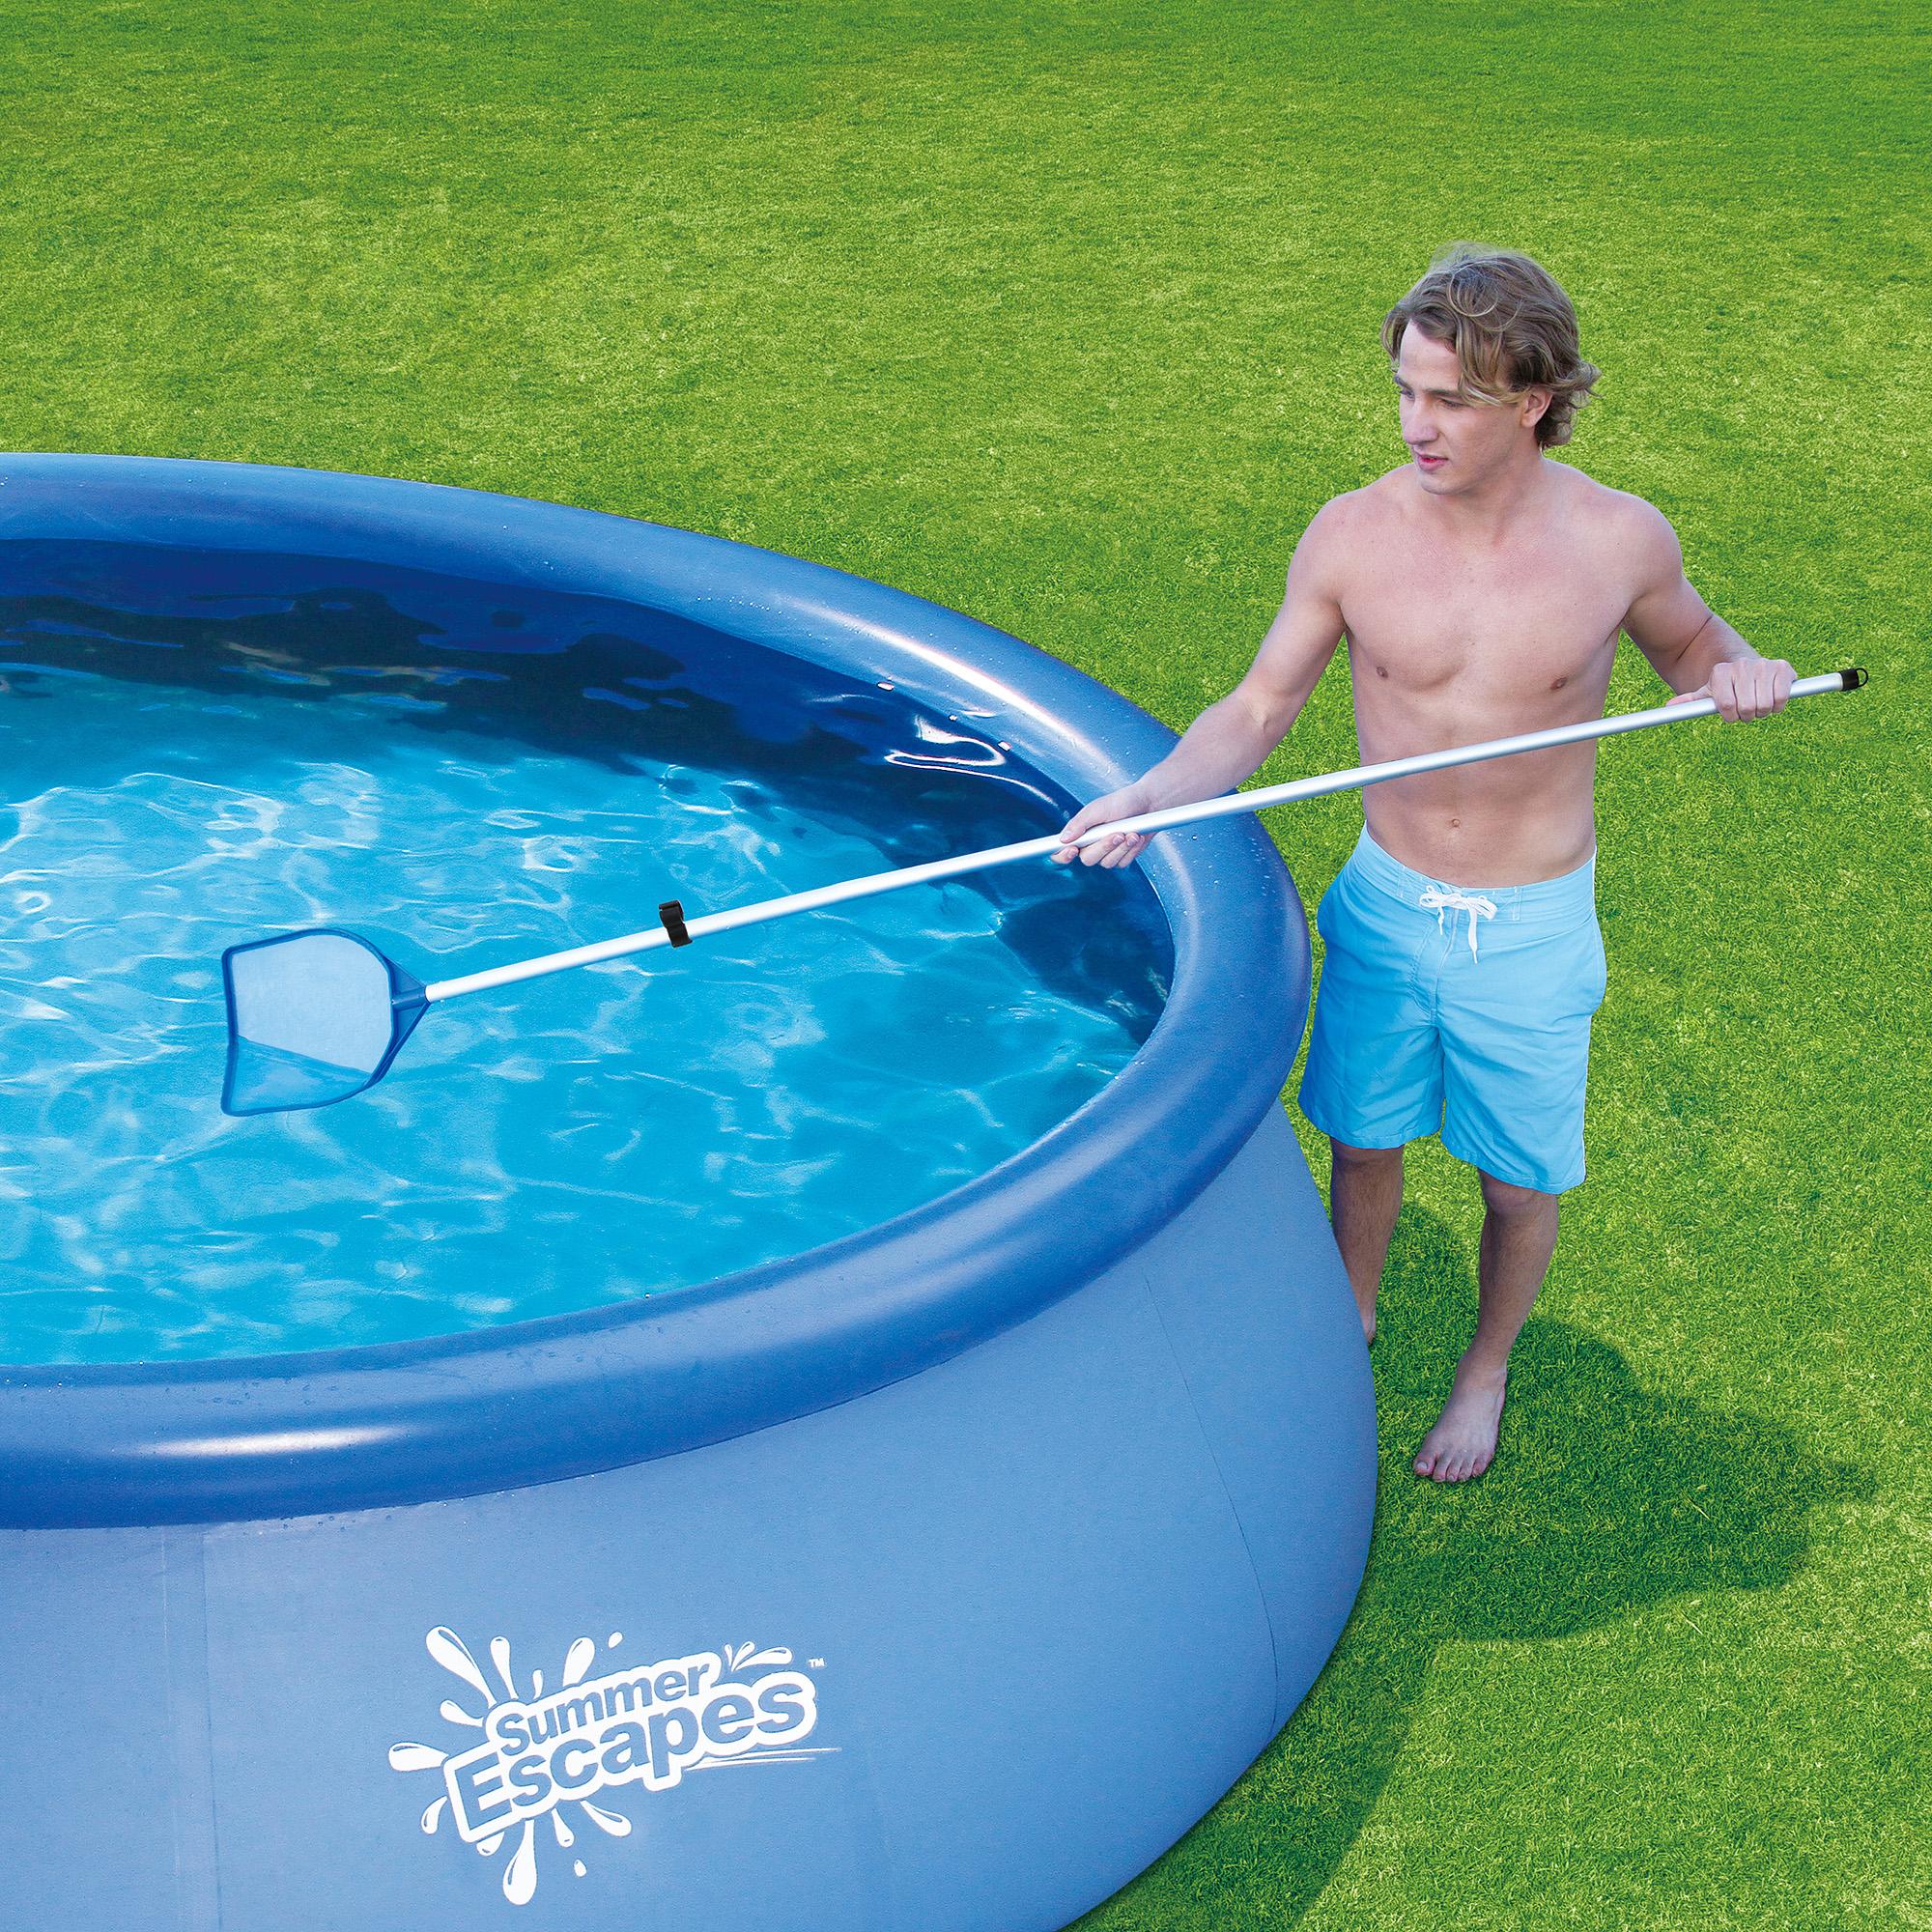 Summer Escapes Pool Maintenance Kit, Silver/Blue